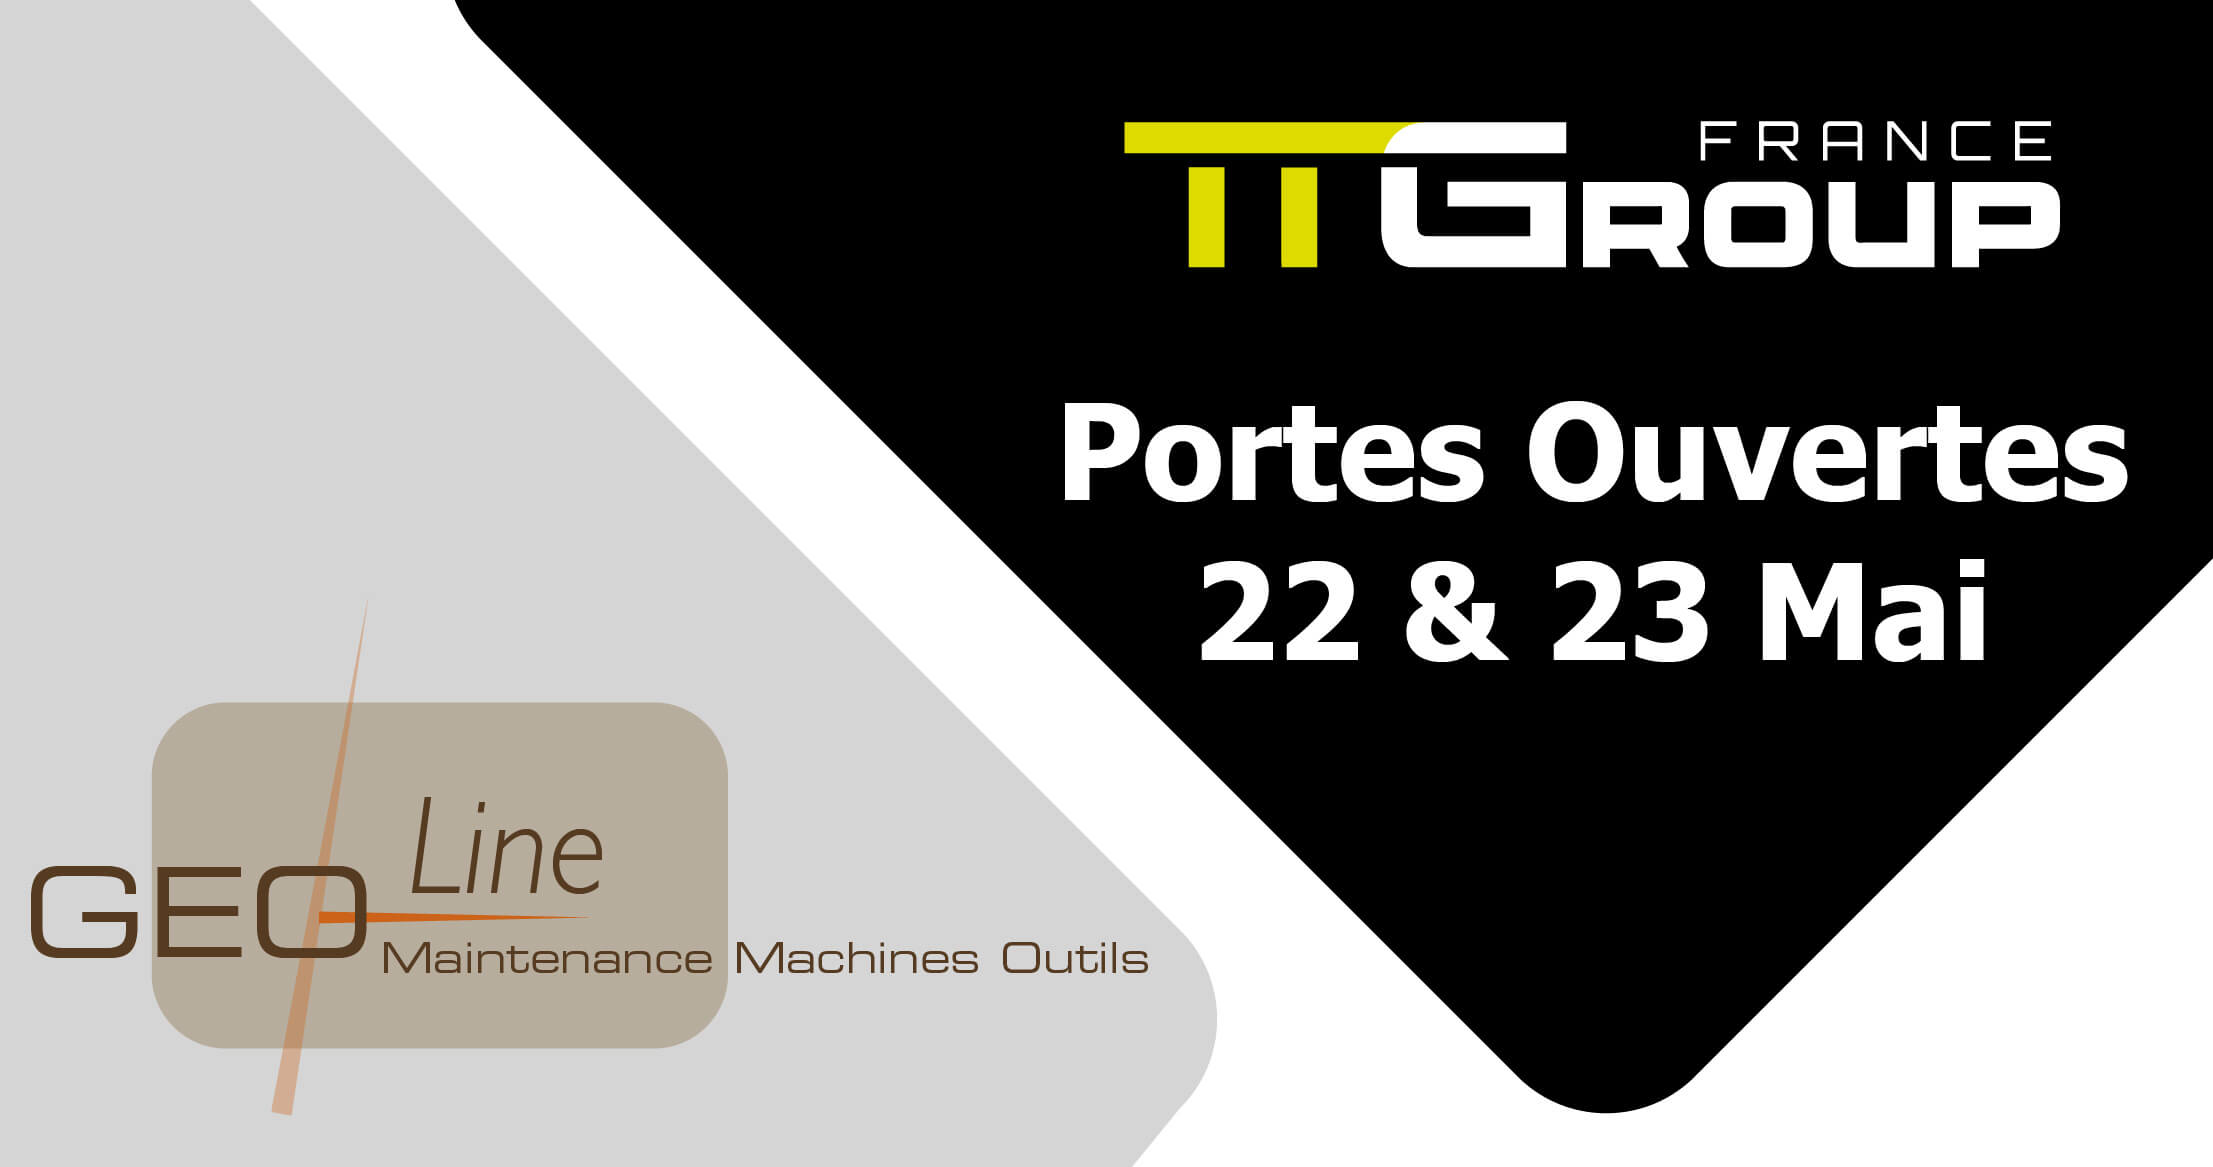 Journées Portes Ouvertes GeoLine - TTGroup France